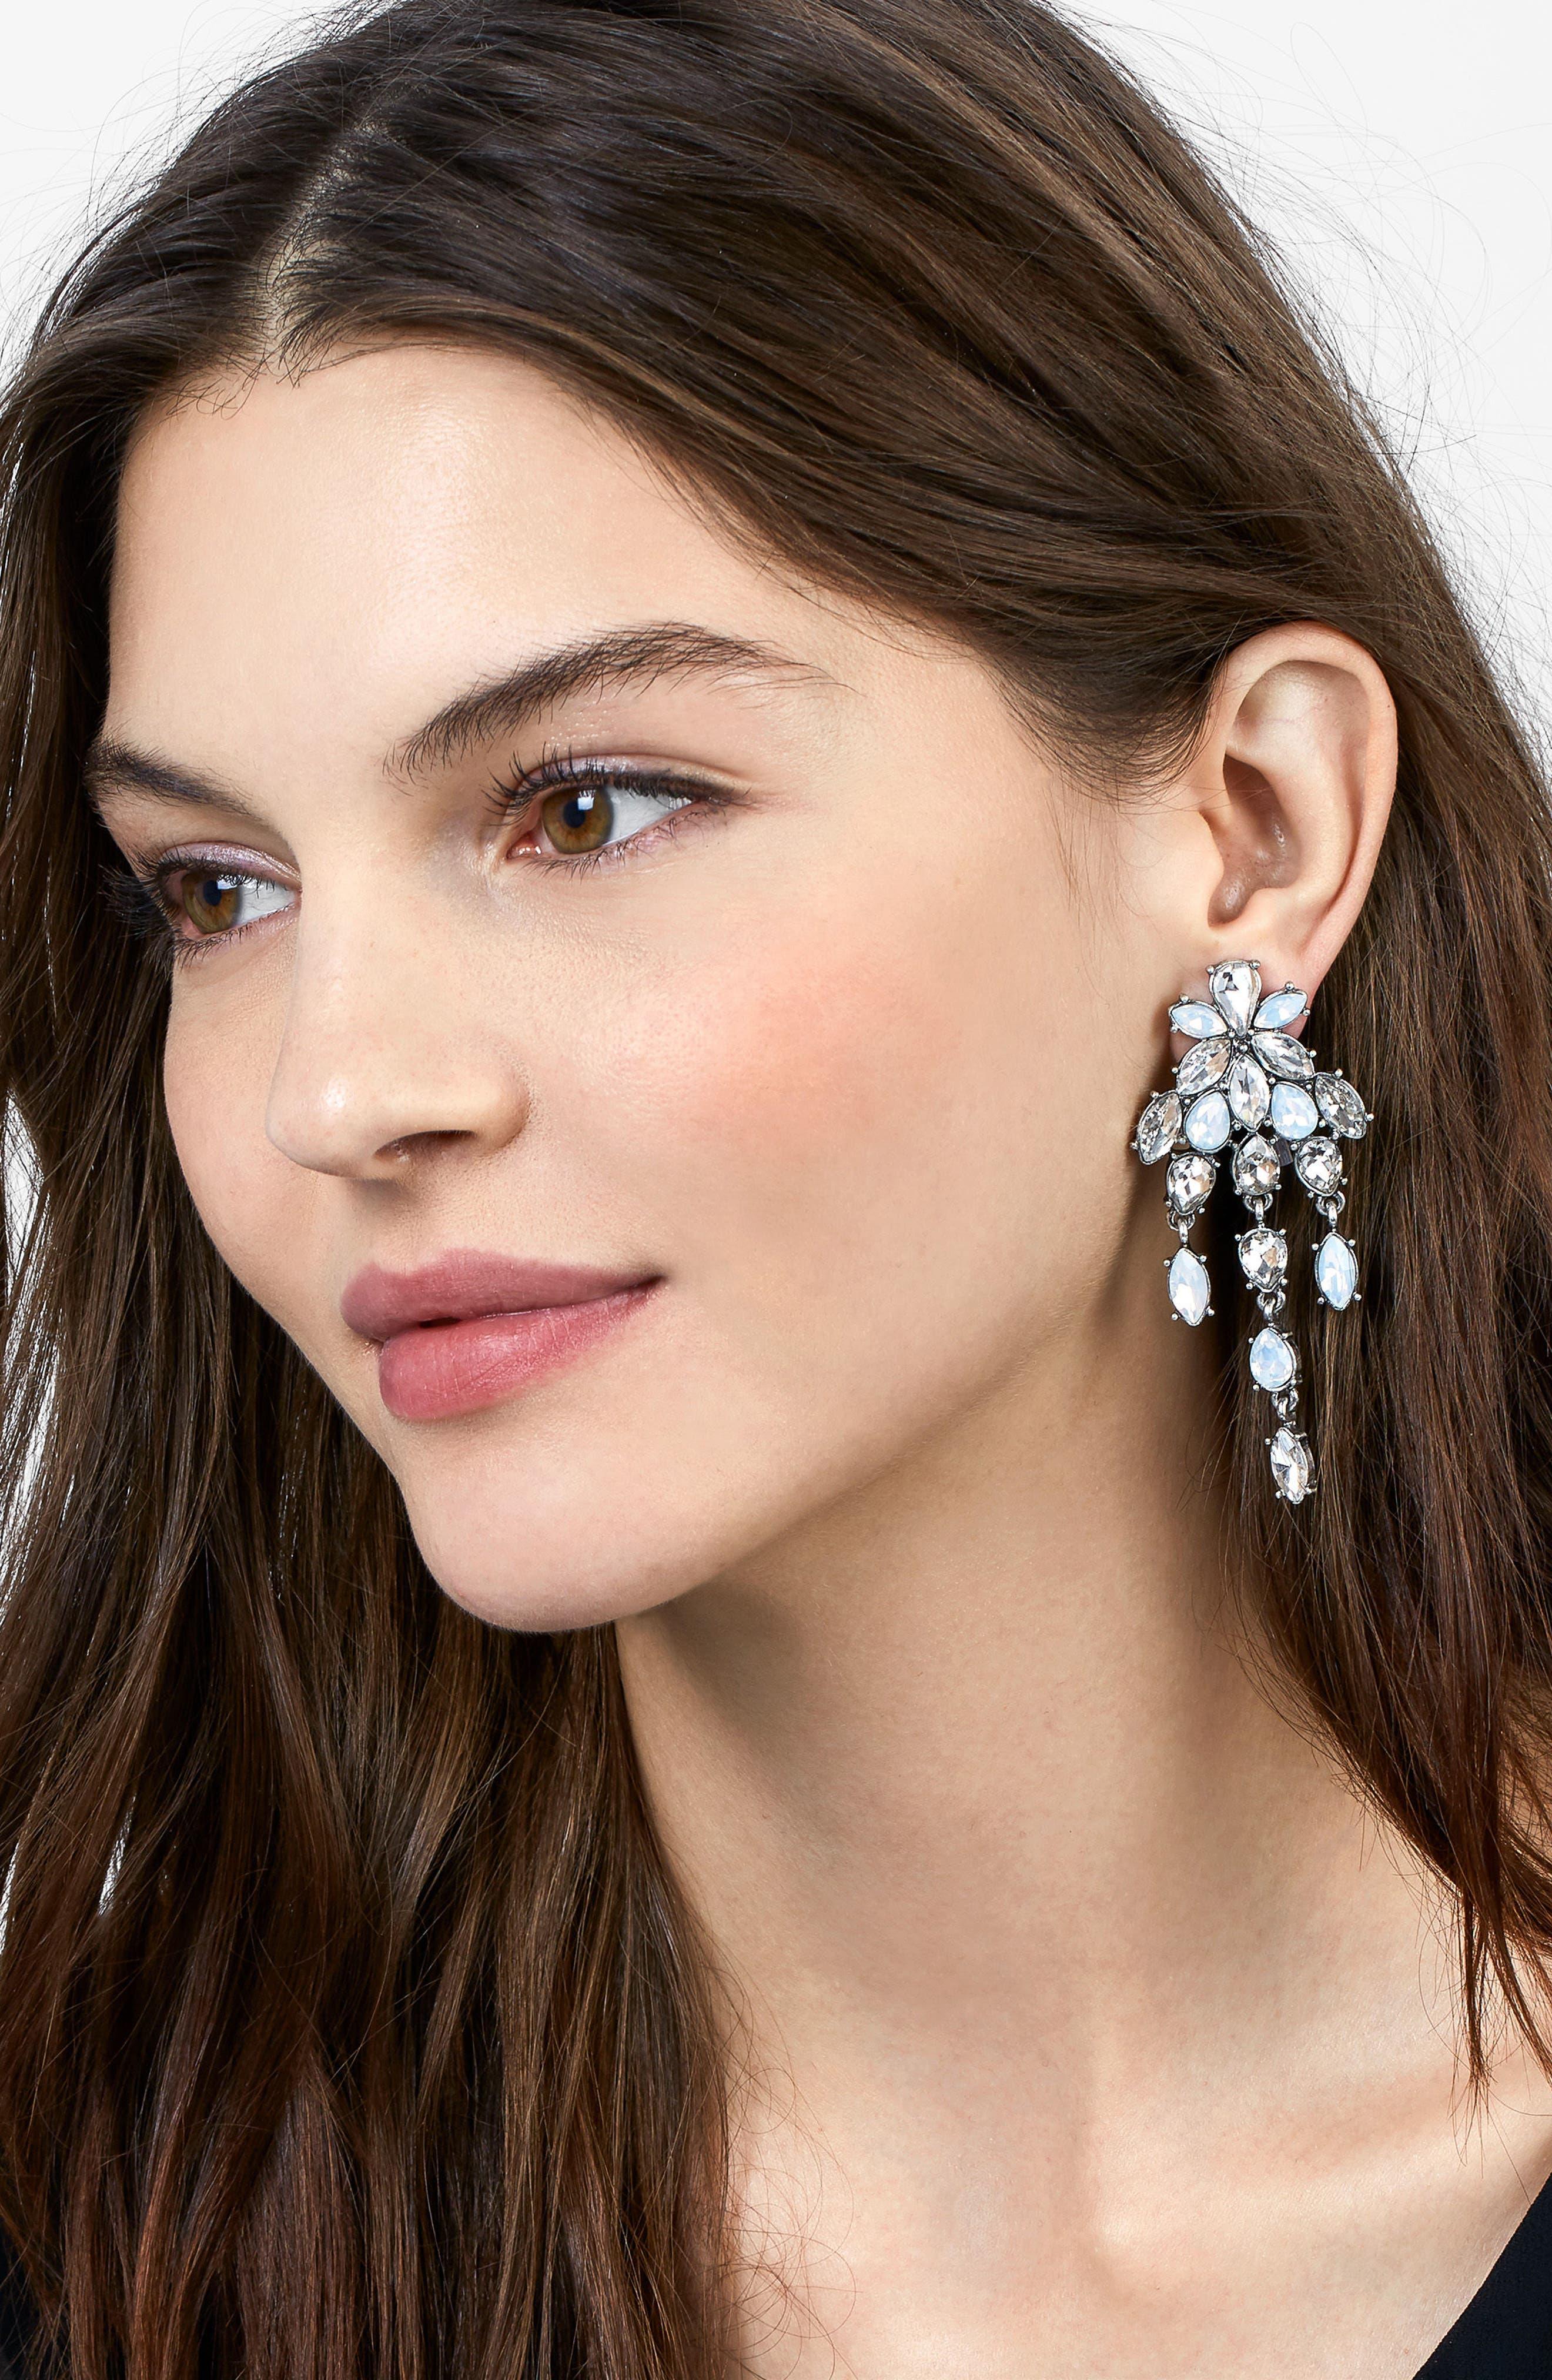 Chandelier Crystal Drop Earrings,                             Alternate thumbnail 2, color,                             040